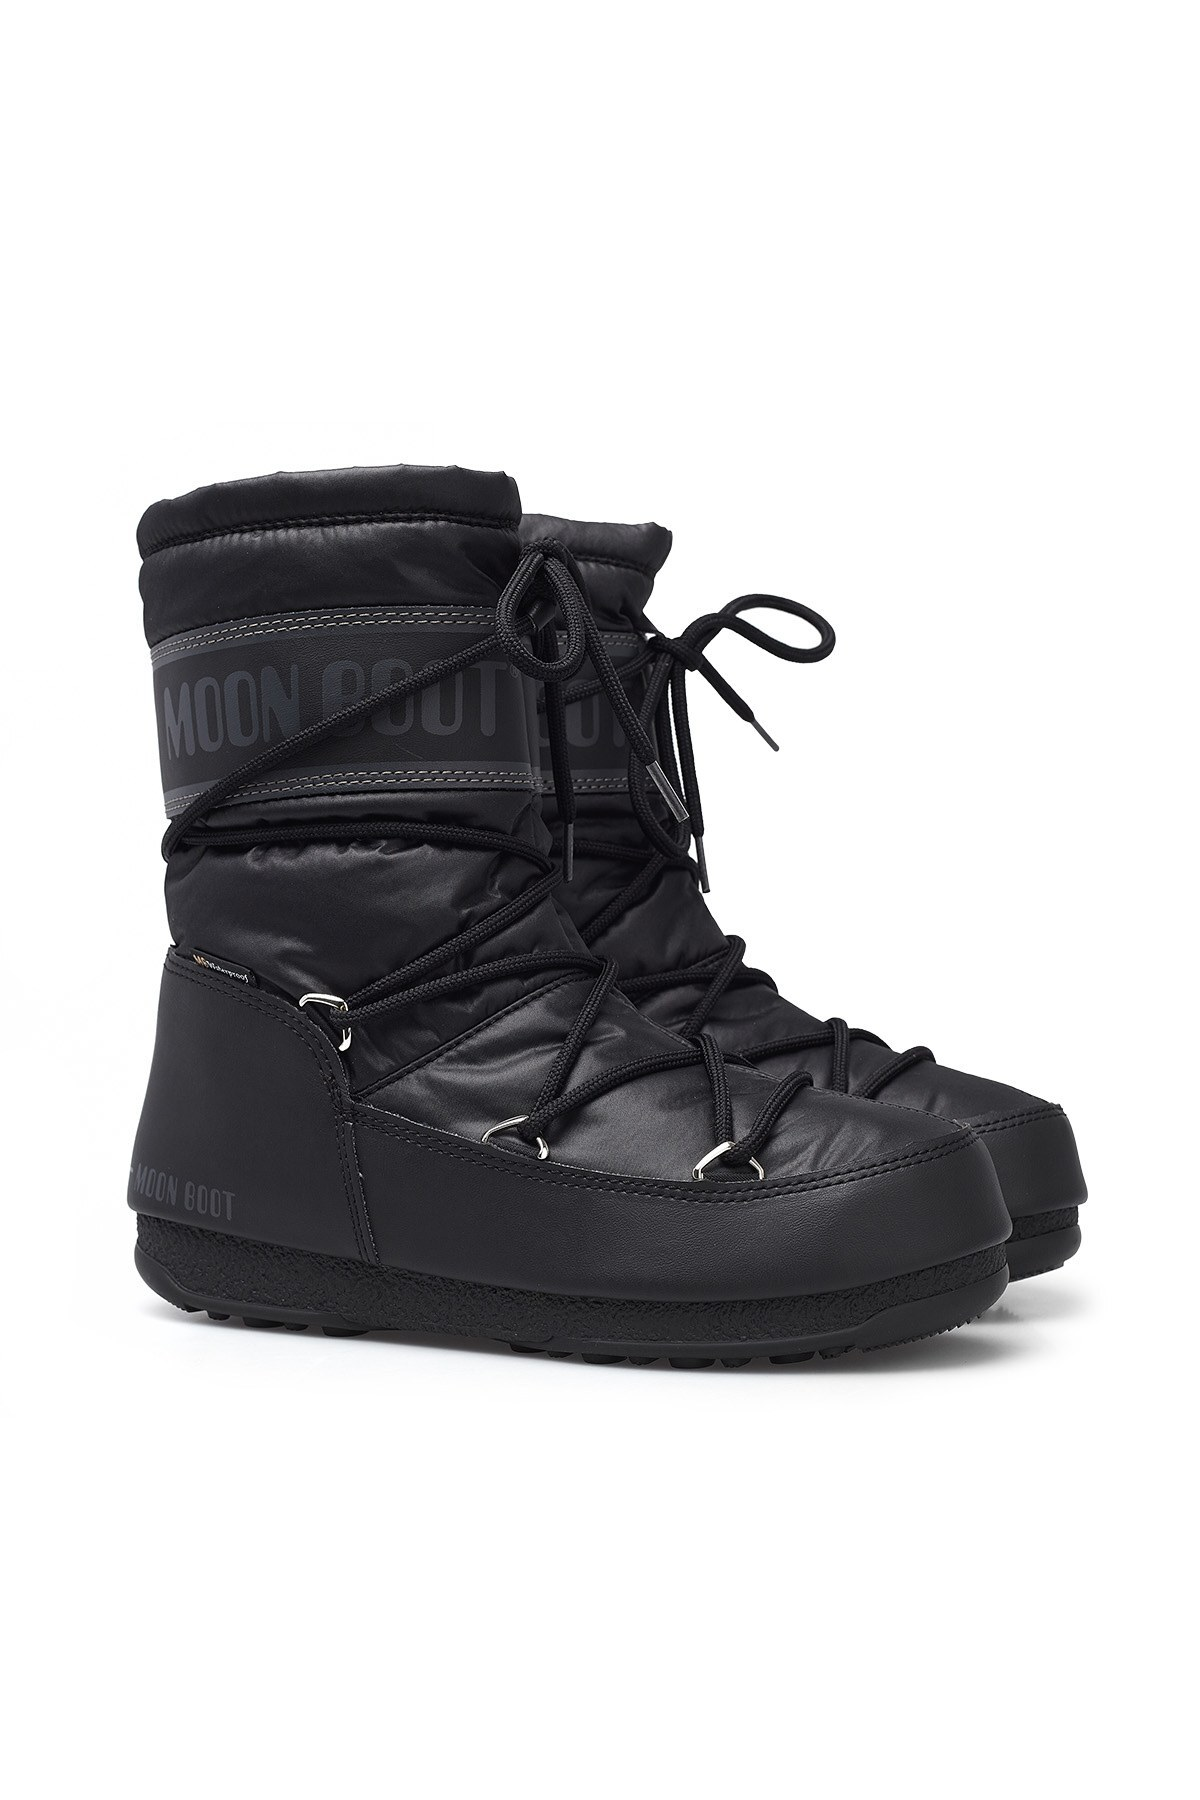 Moon Boot/SİYAH/39 Bayan Kar Botu 24009200 001 SİYAH